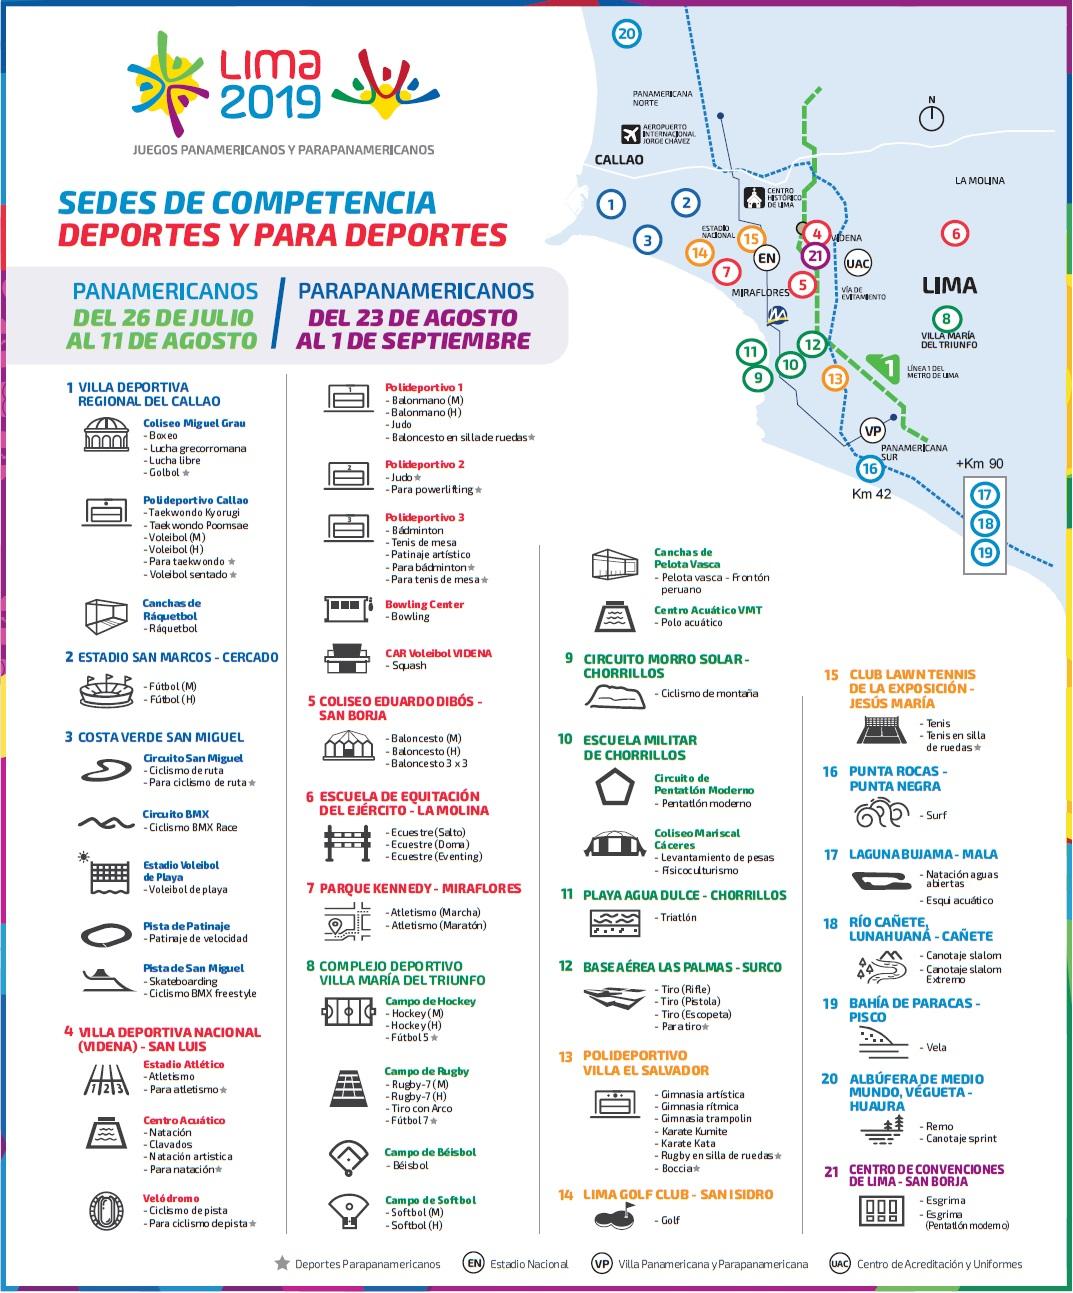 Calendario Juegos Panamericanos Lima 2019 Entradas.Lima 2019 Presenta Calendario De Juegos Panamericanos Y